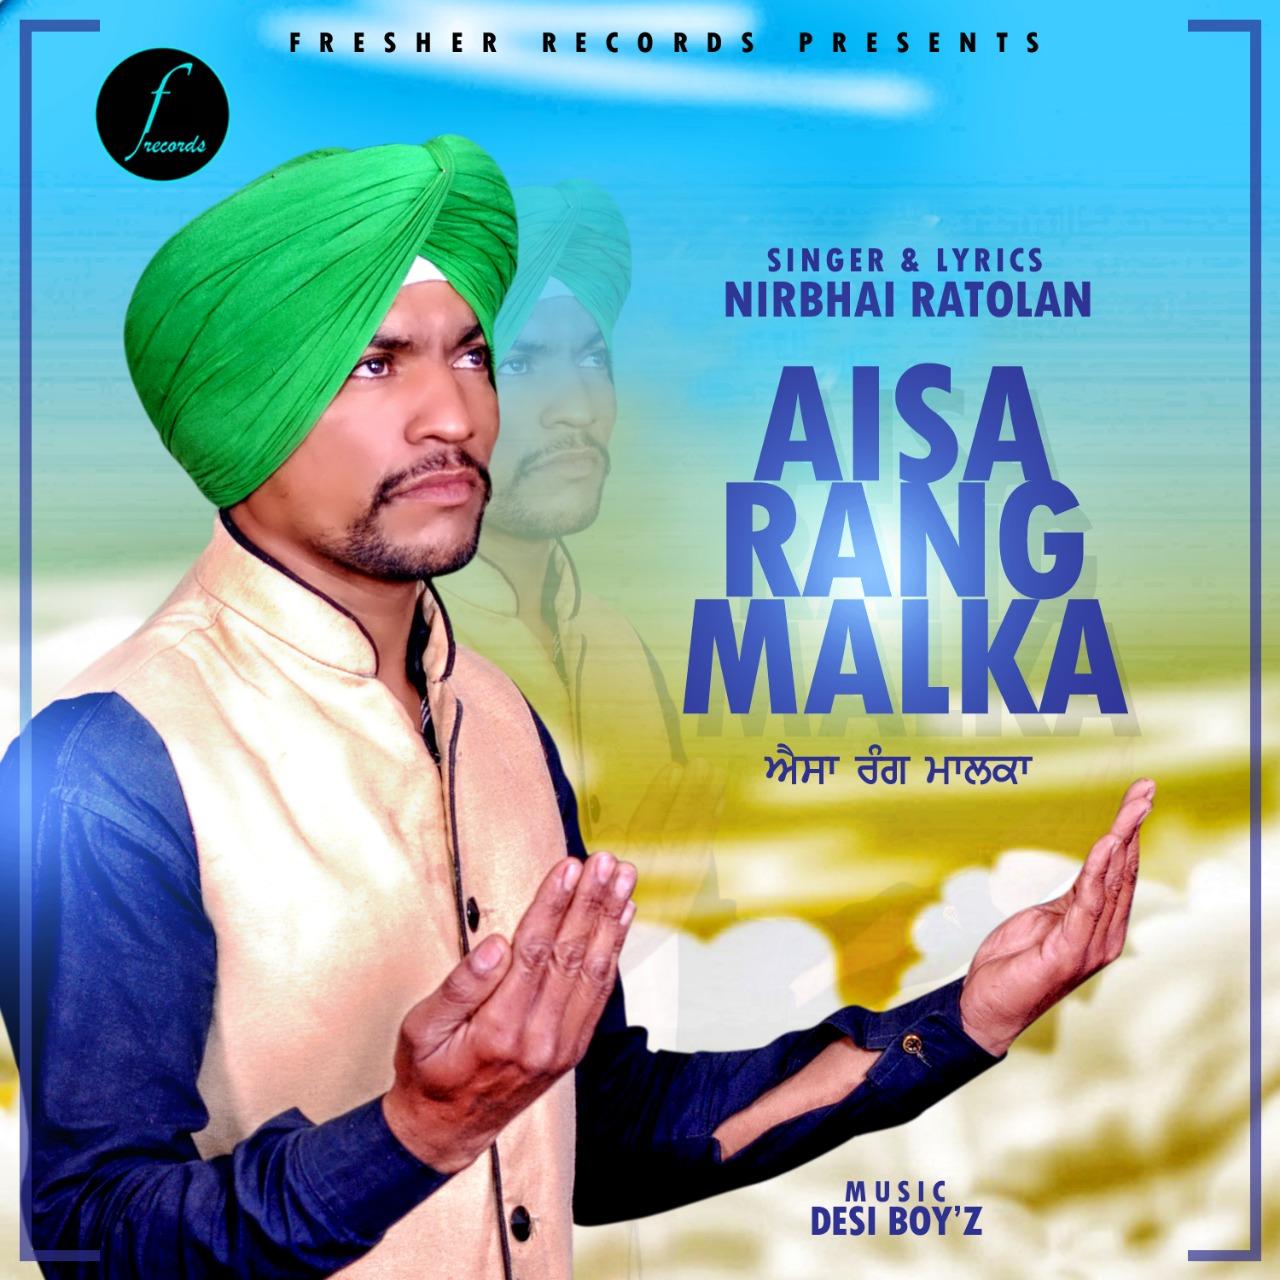 One Man By Singa Song Download Mr Jatt: Latest Punjabi Songs New Punjabi Songs-Get 10 Paise/View